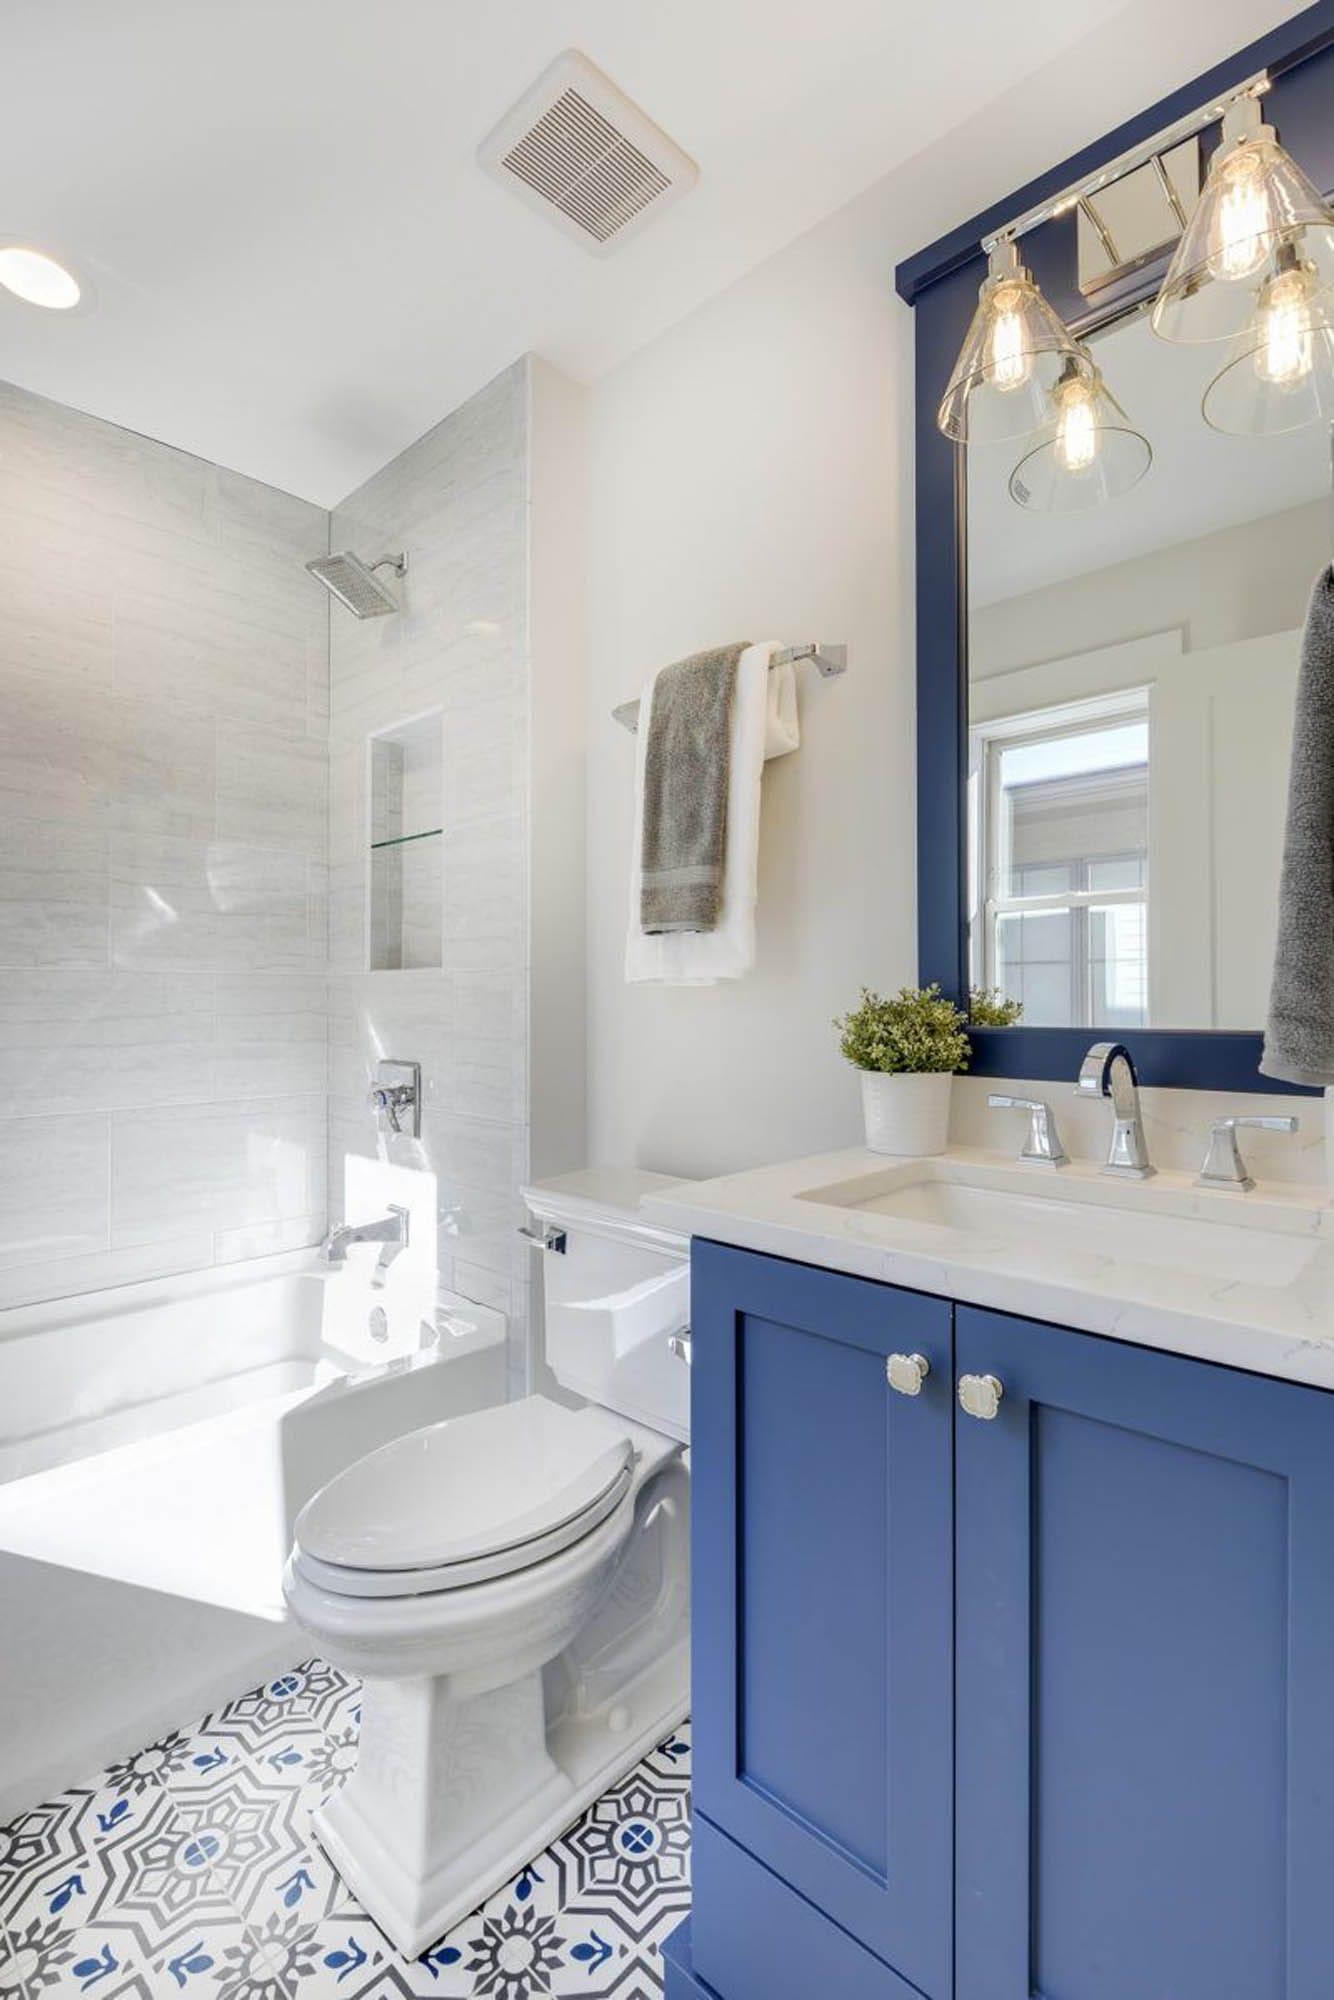 Bathroom with blue vanity cabinet